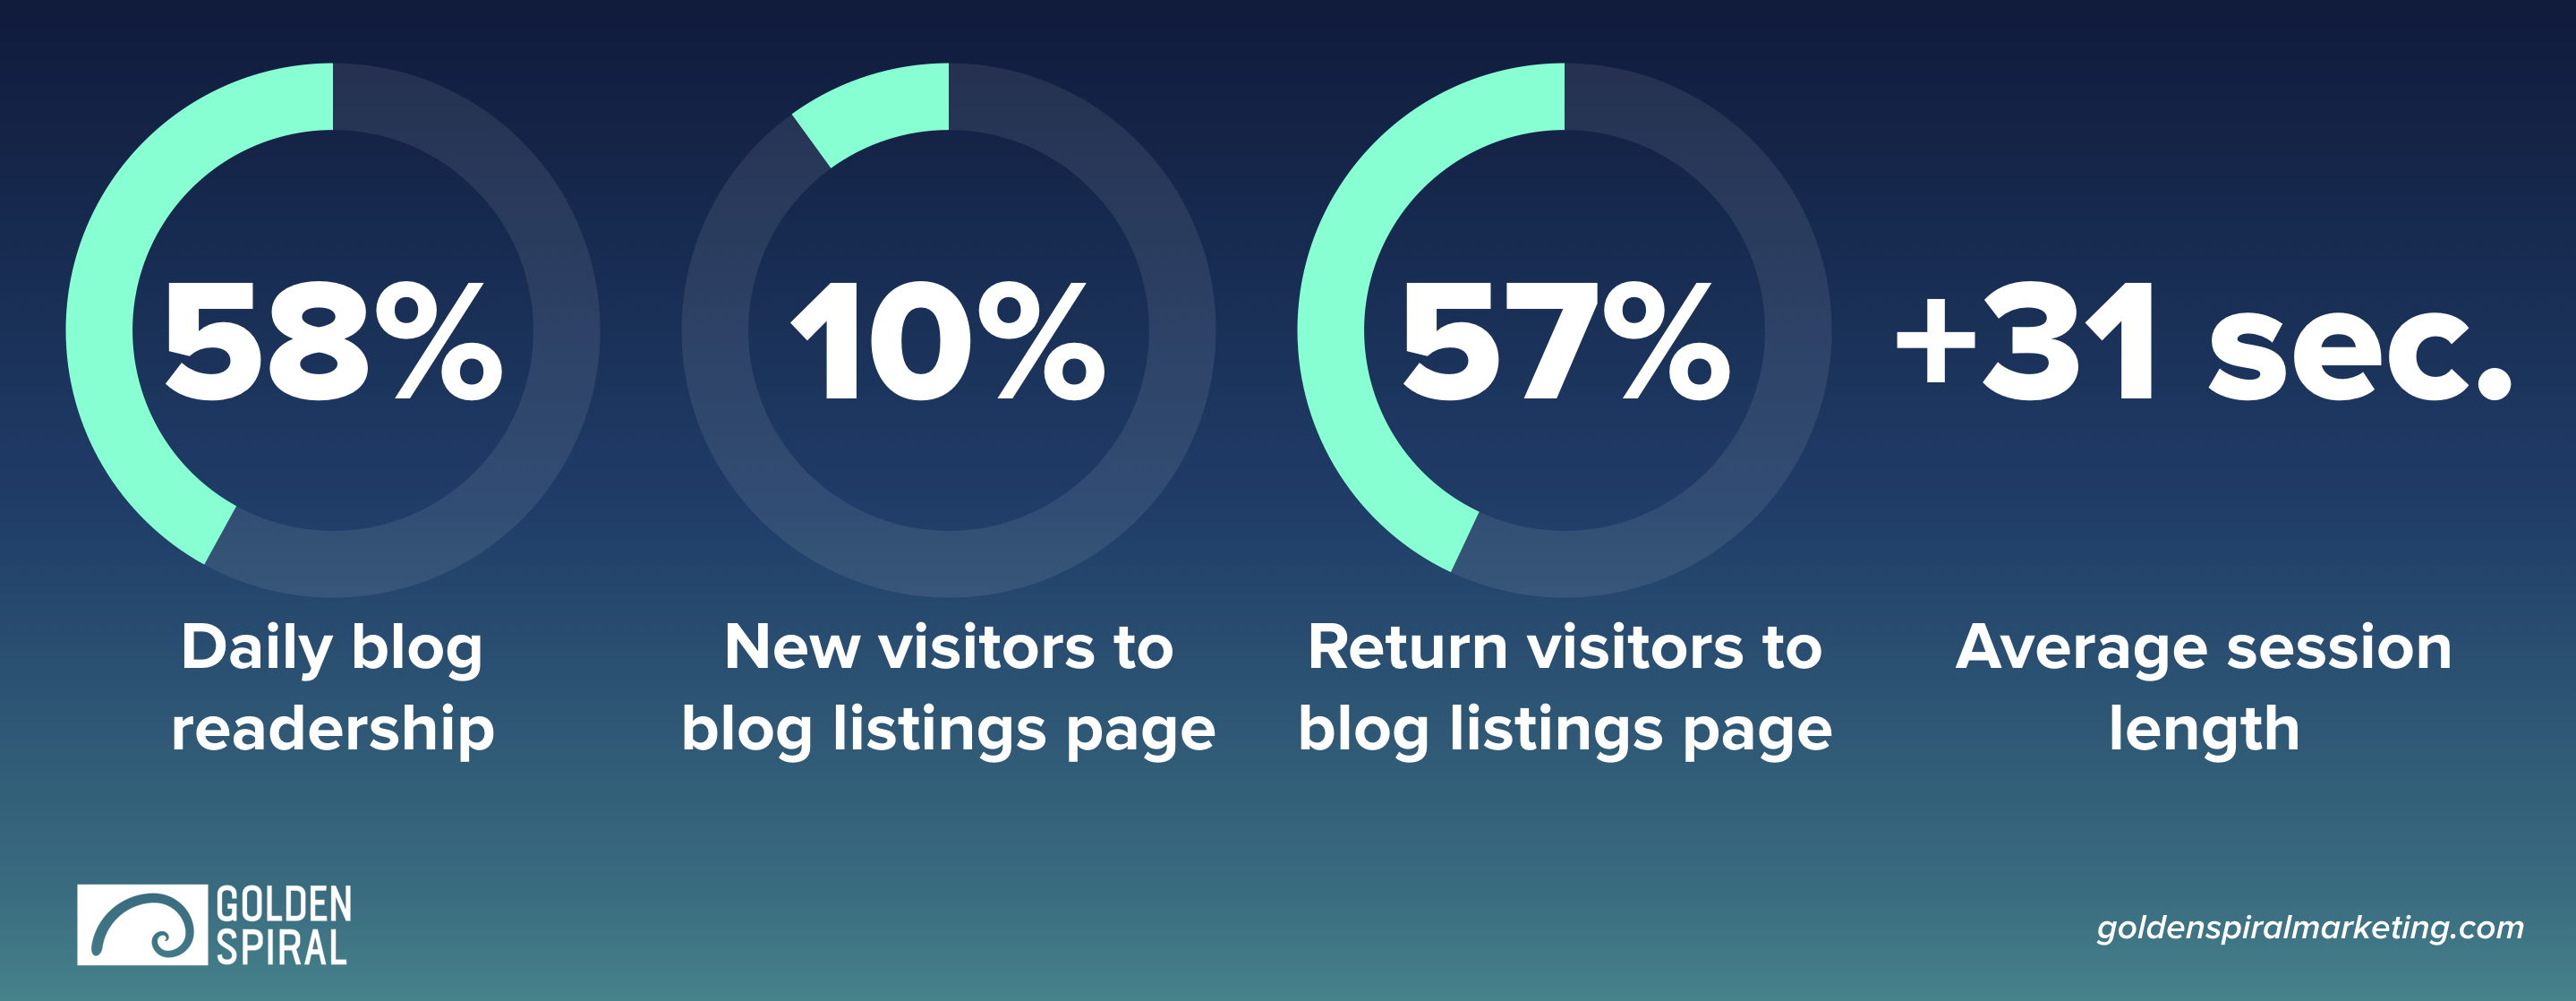 Blog Conversion Statistics